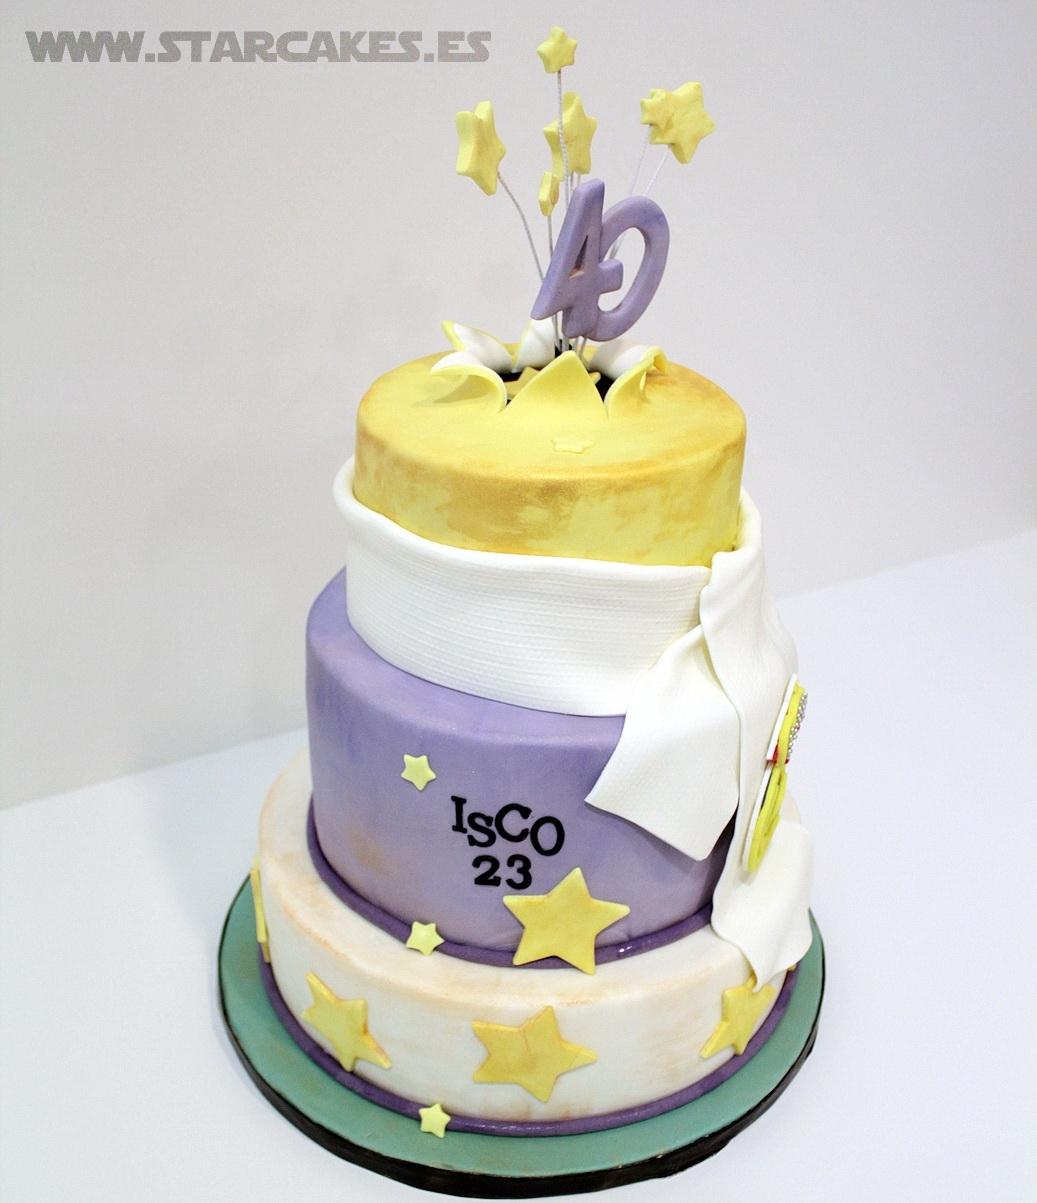 Real Madrid Birthday Cake CakeCentralcom - Real birthday cake images